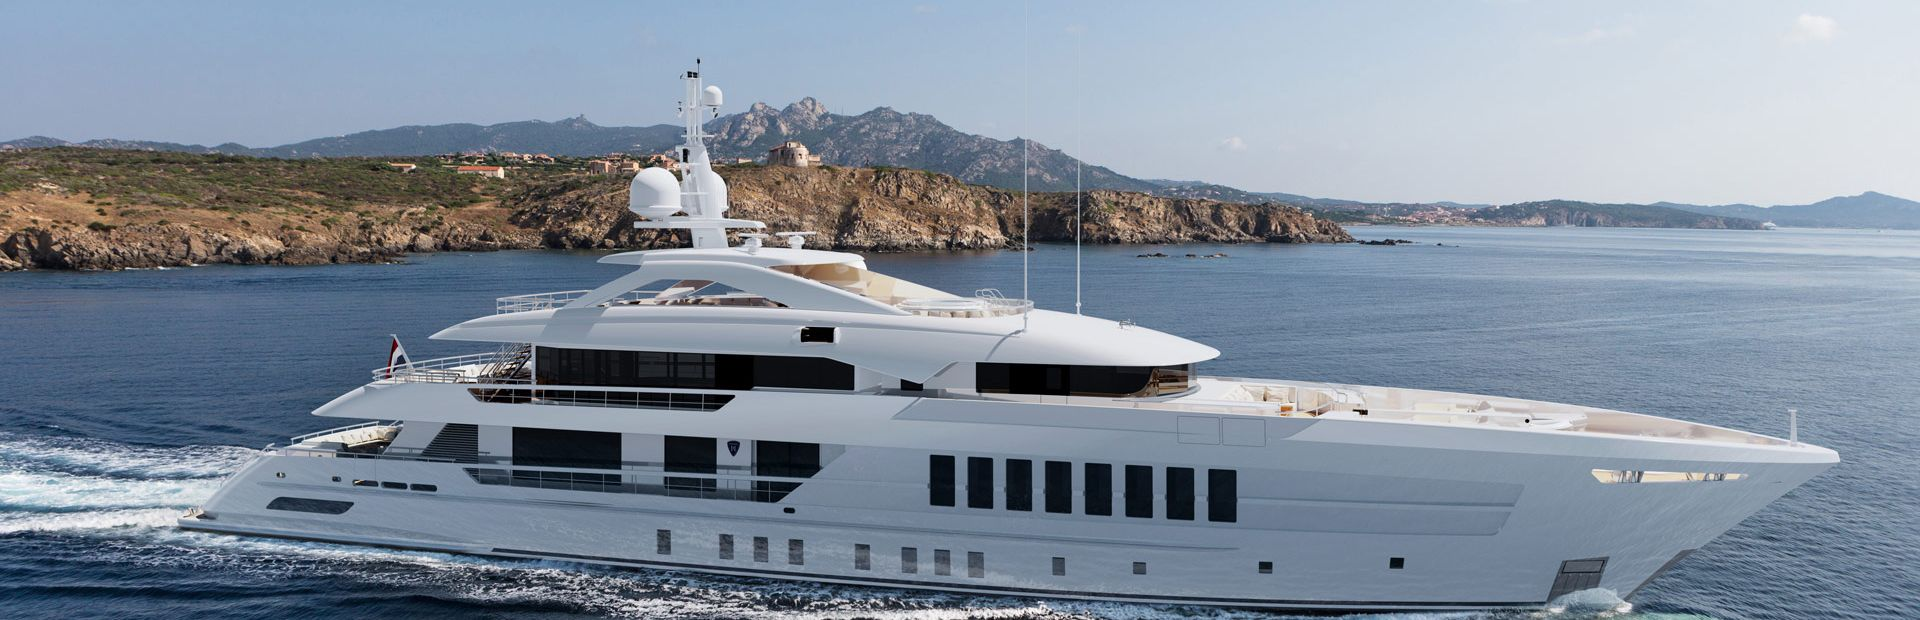 55m Steel Yacht Charter